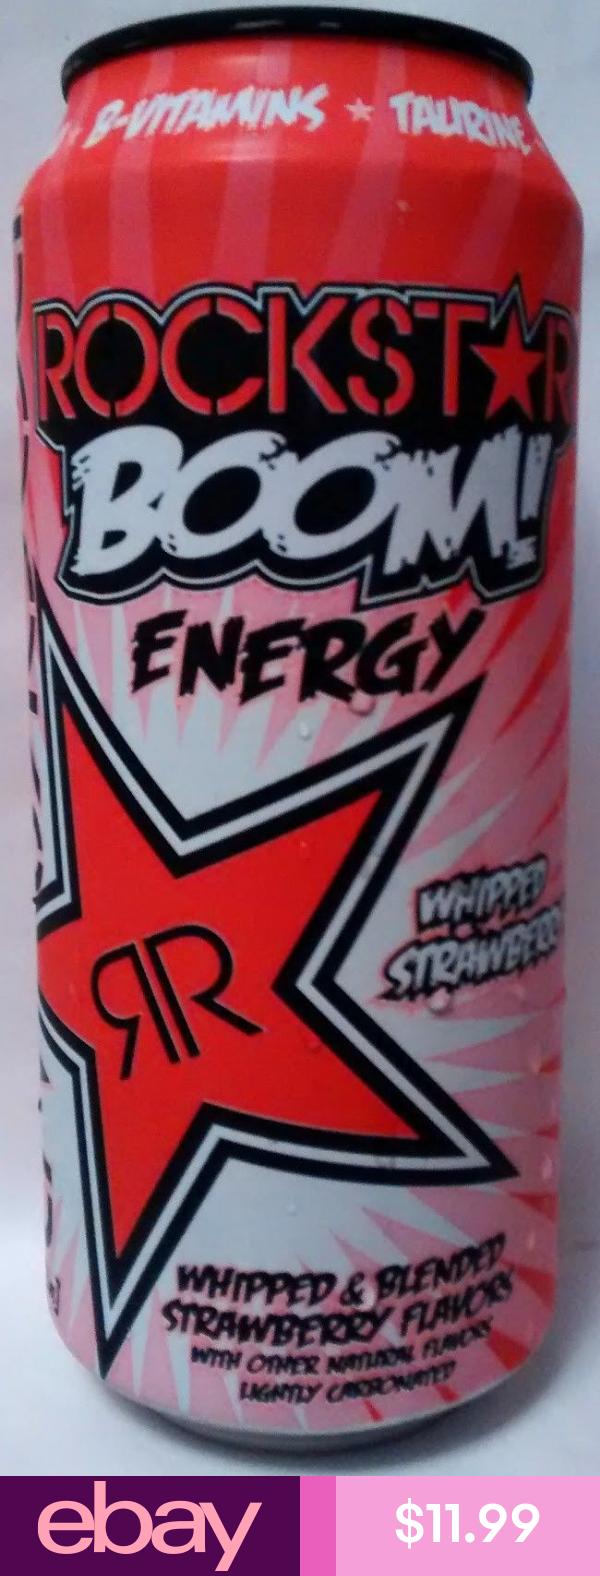 Rockstar eBayEnergy Drinks Health & Beauty Rockstar